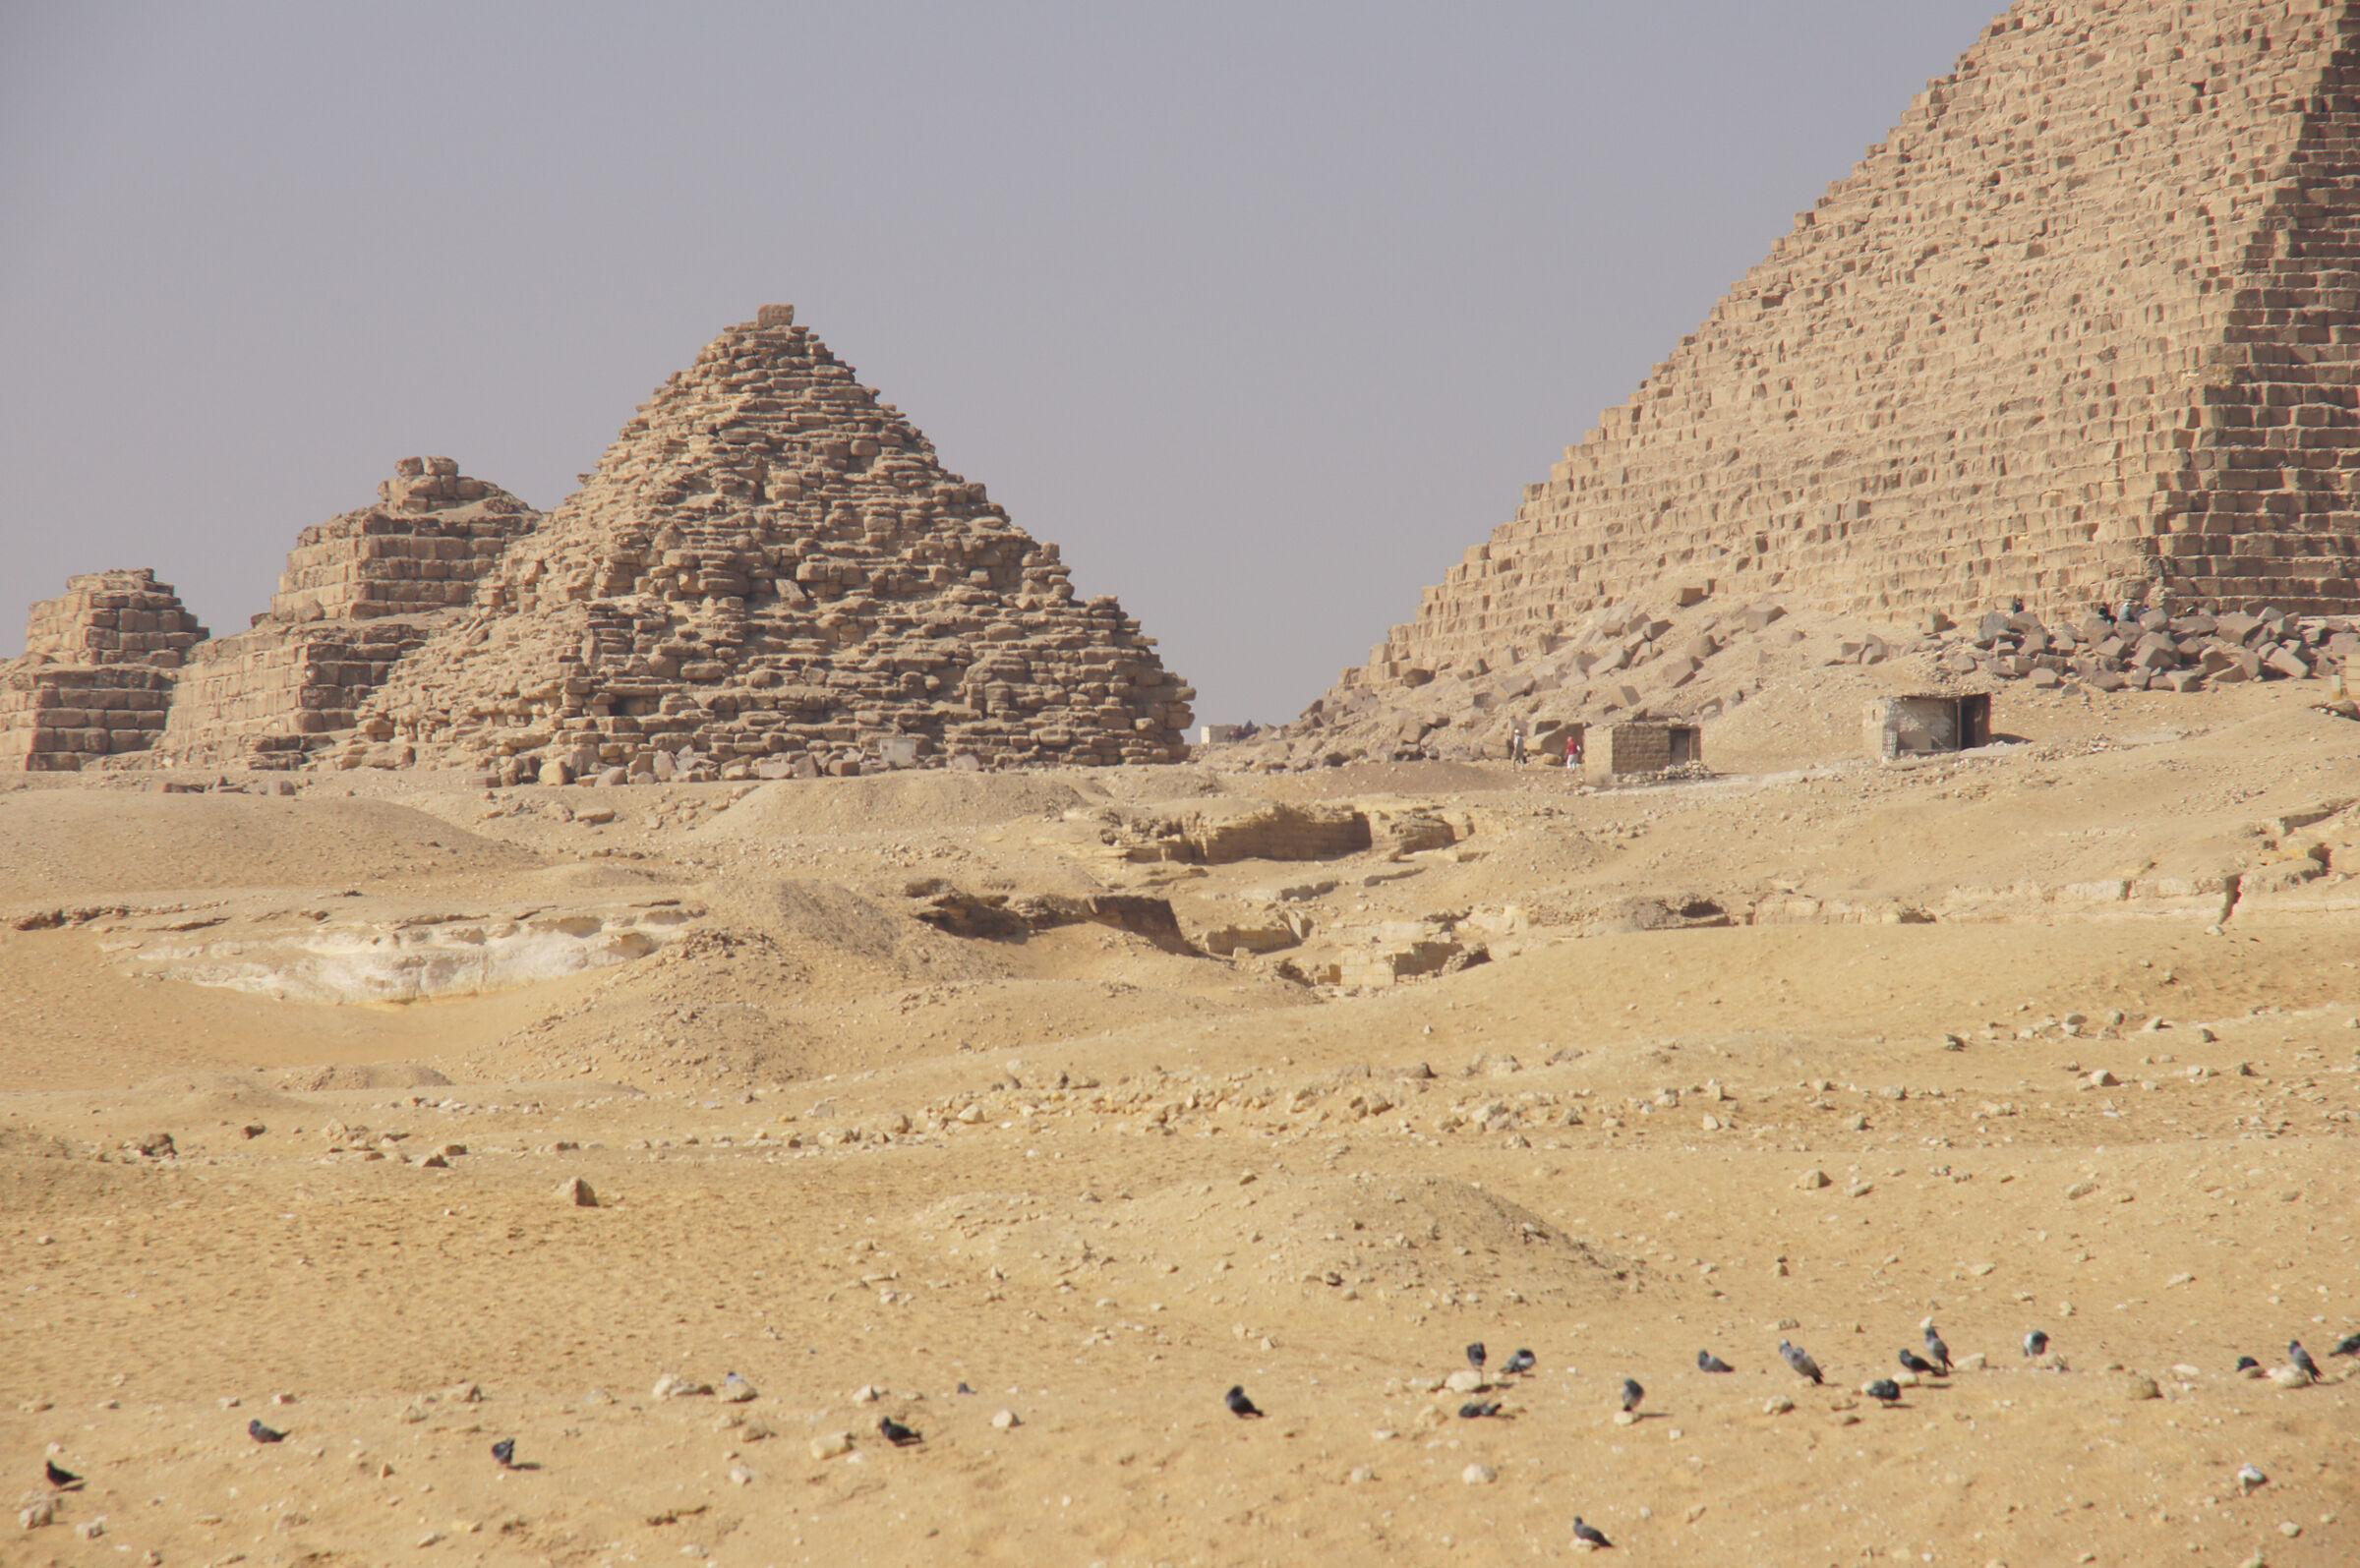 Menkaure Pyramid Complex: Site: Giza; View: Menkaure Pyramid, G III-a, G III-b, G III-c